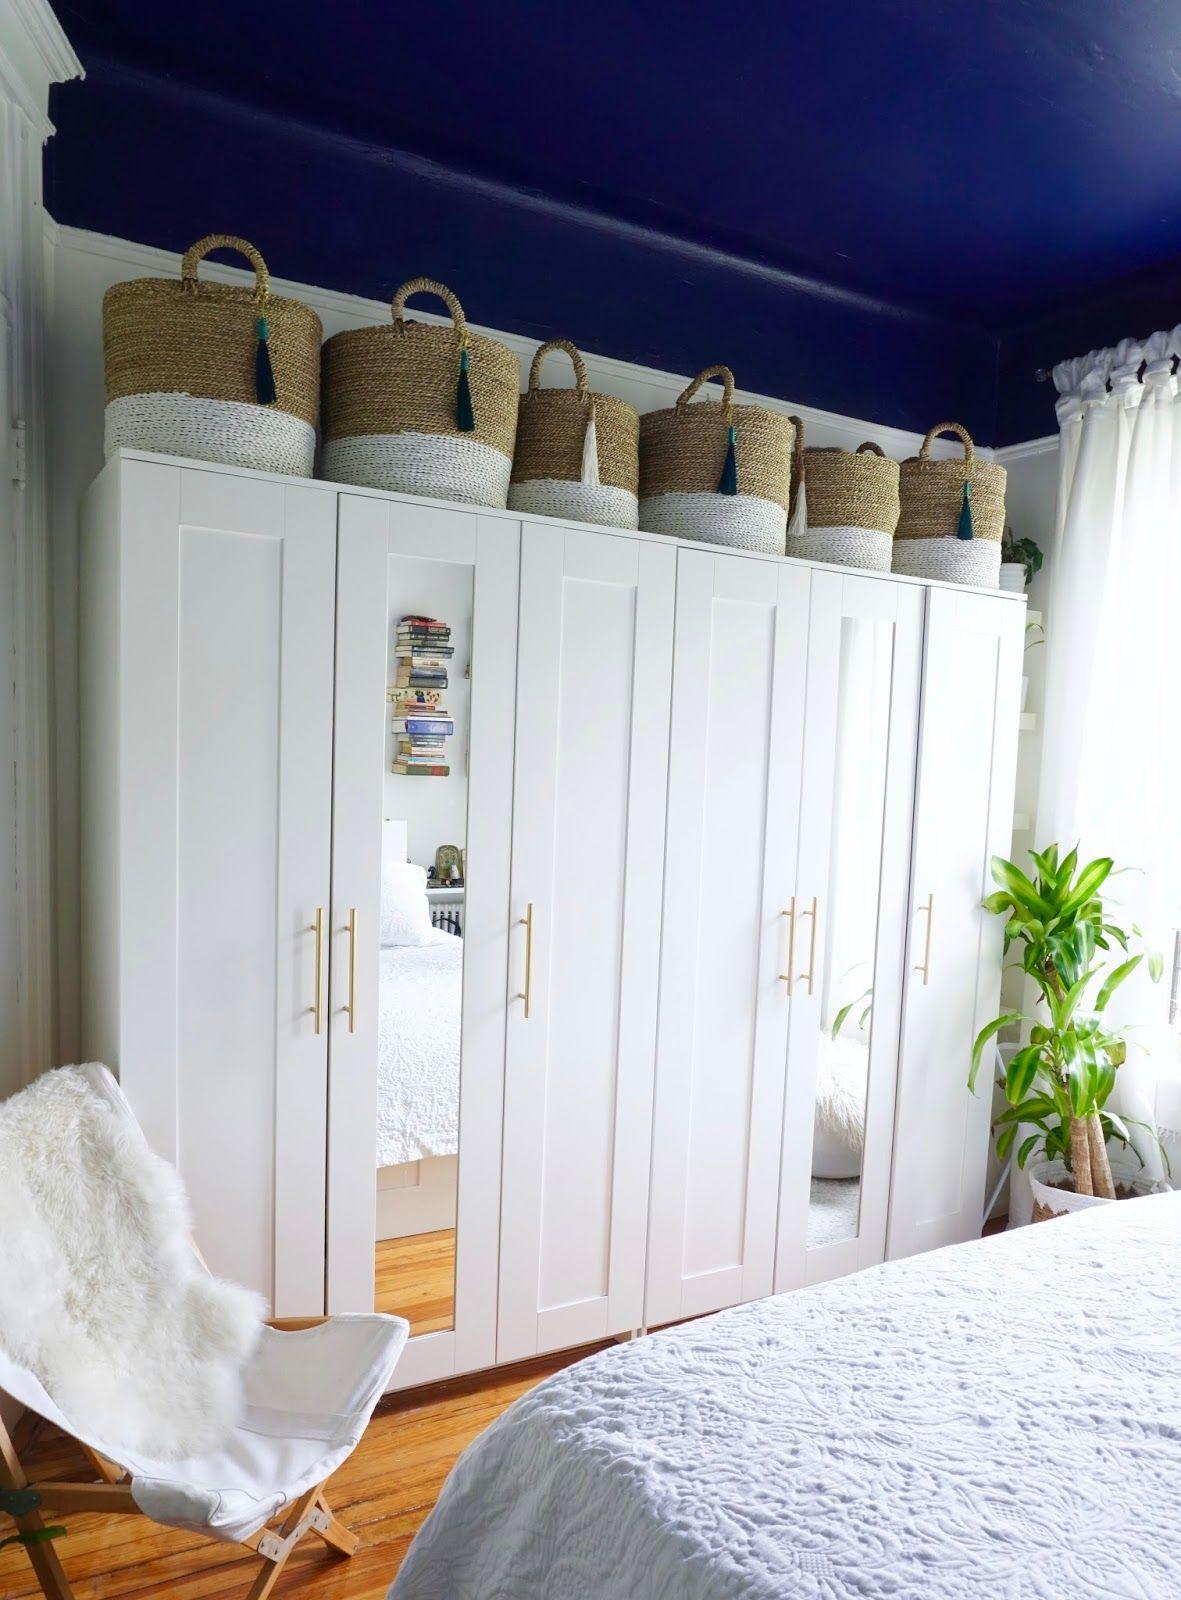 Shared Nursery Reveal Ikea Brimnes Wardrobe Ikea Wardrobe Ikea